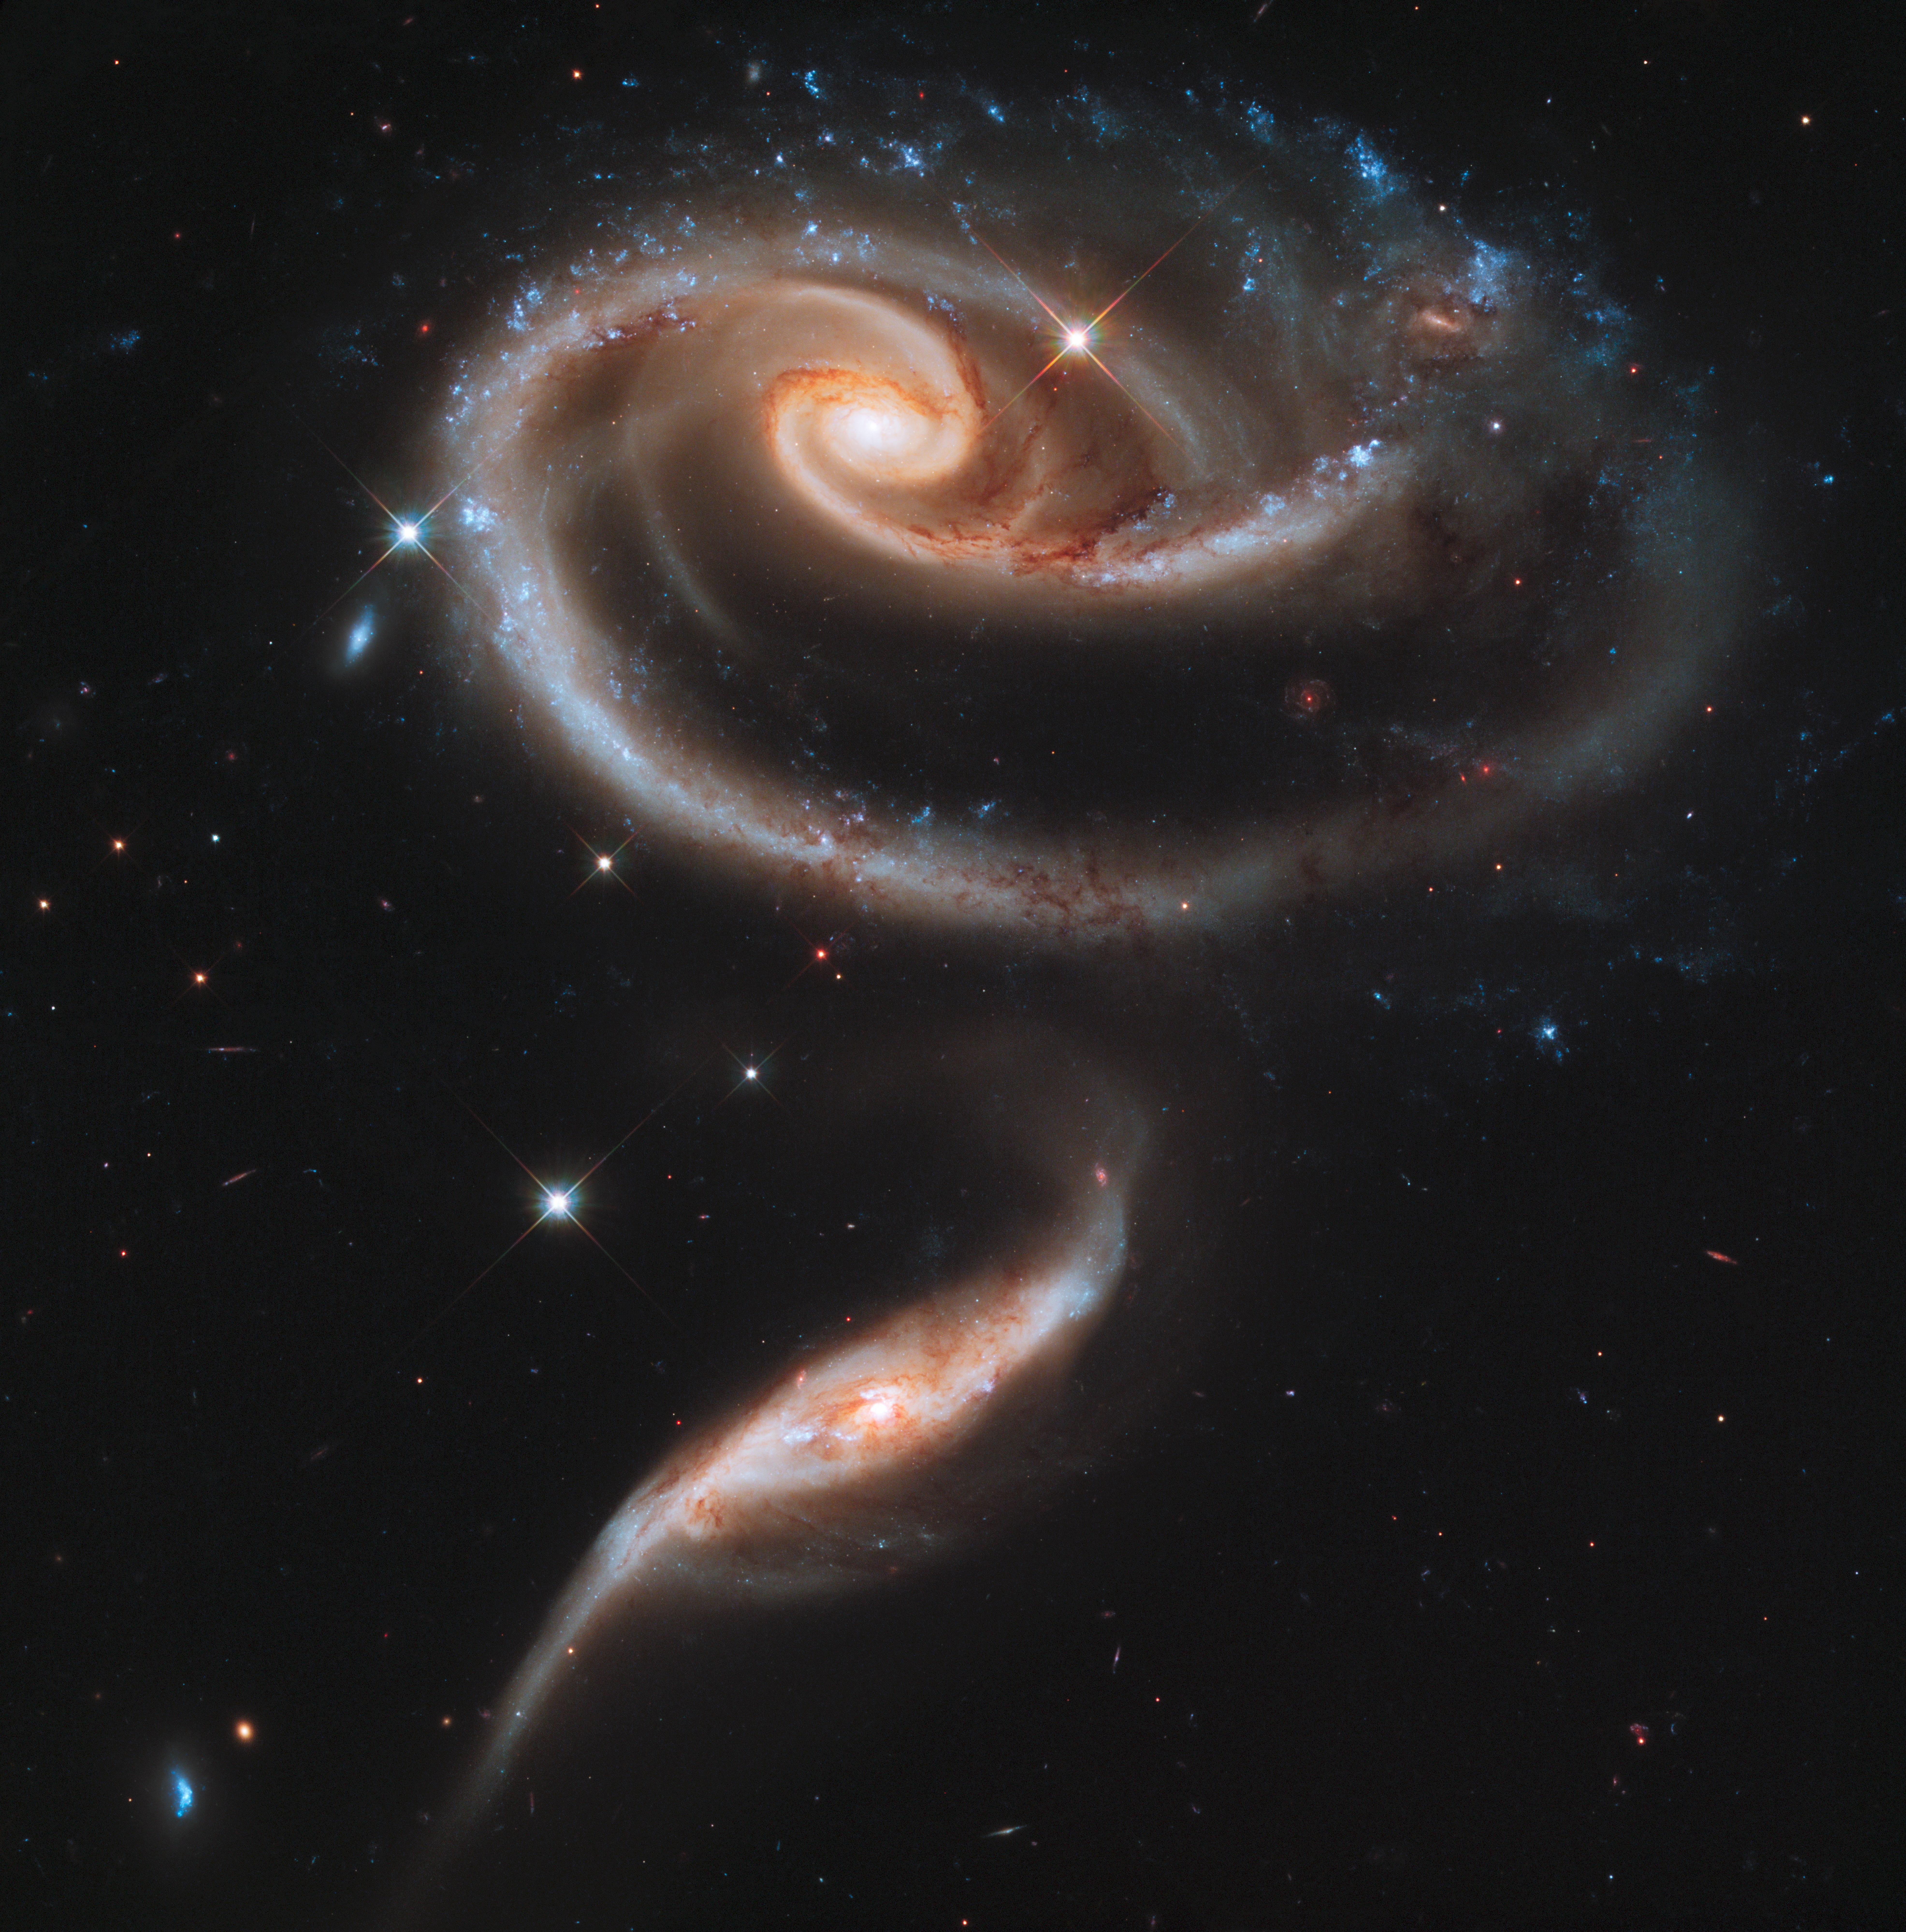 Free stock photo of sky, space, galaxy, stars